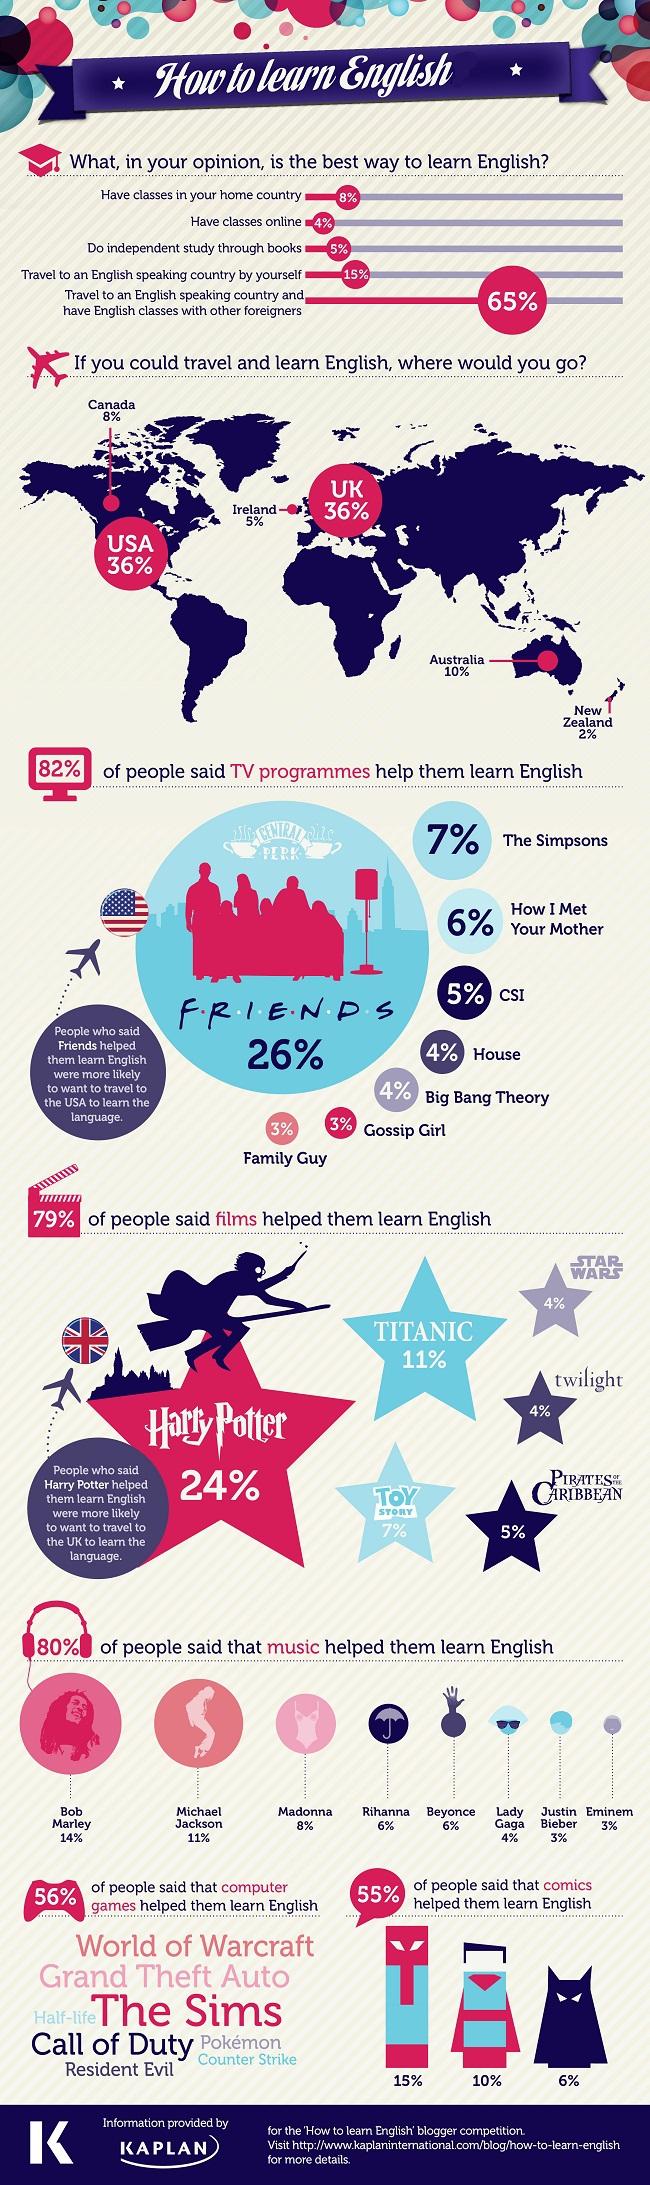 Aprende inglés: cómo aprender inglés